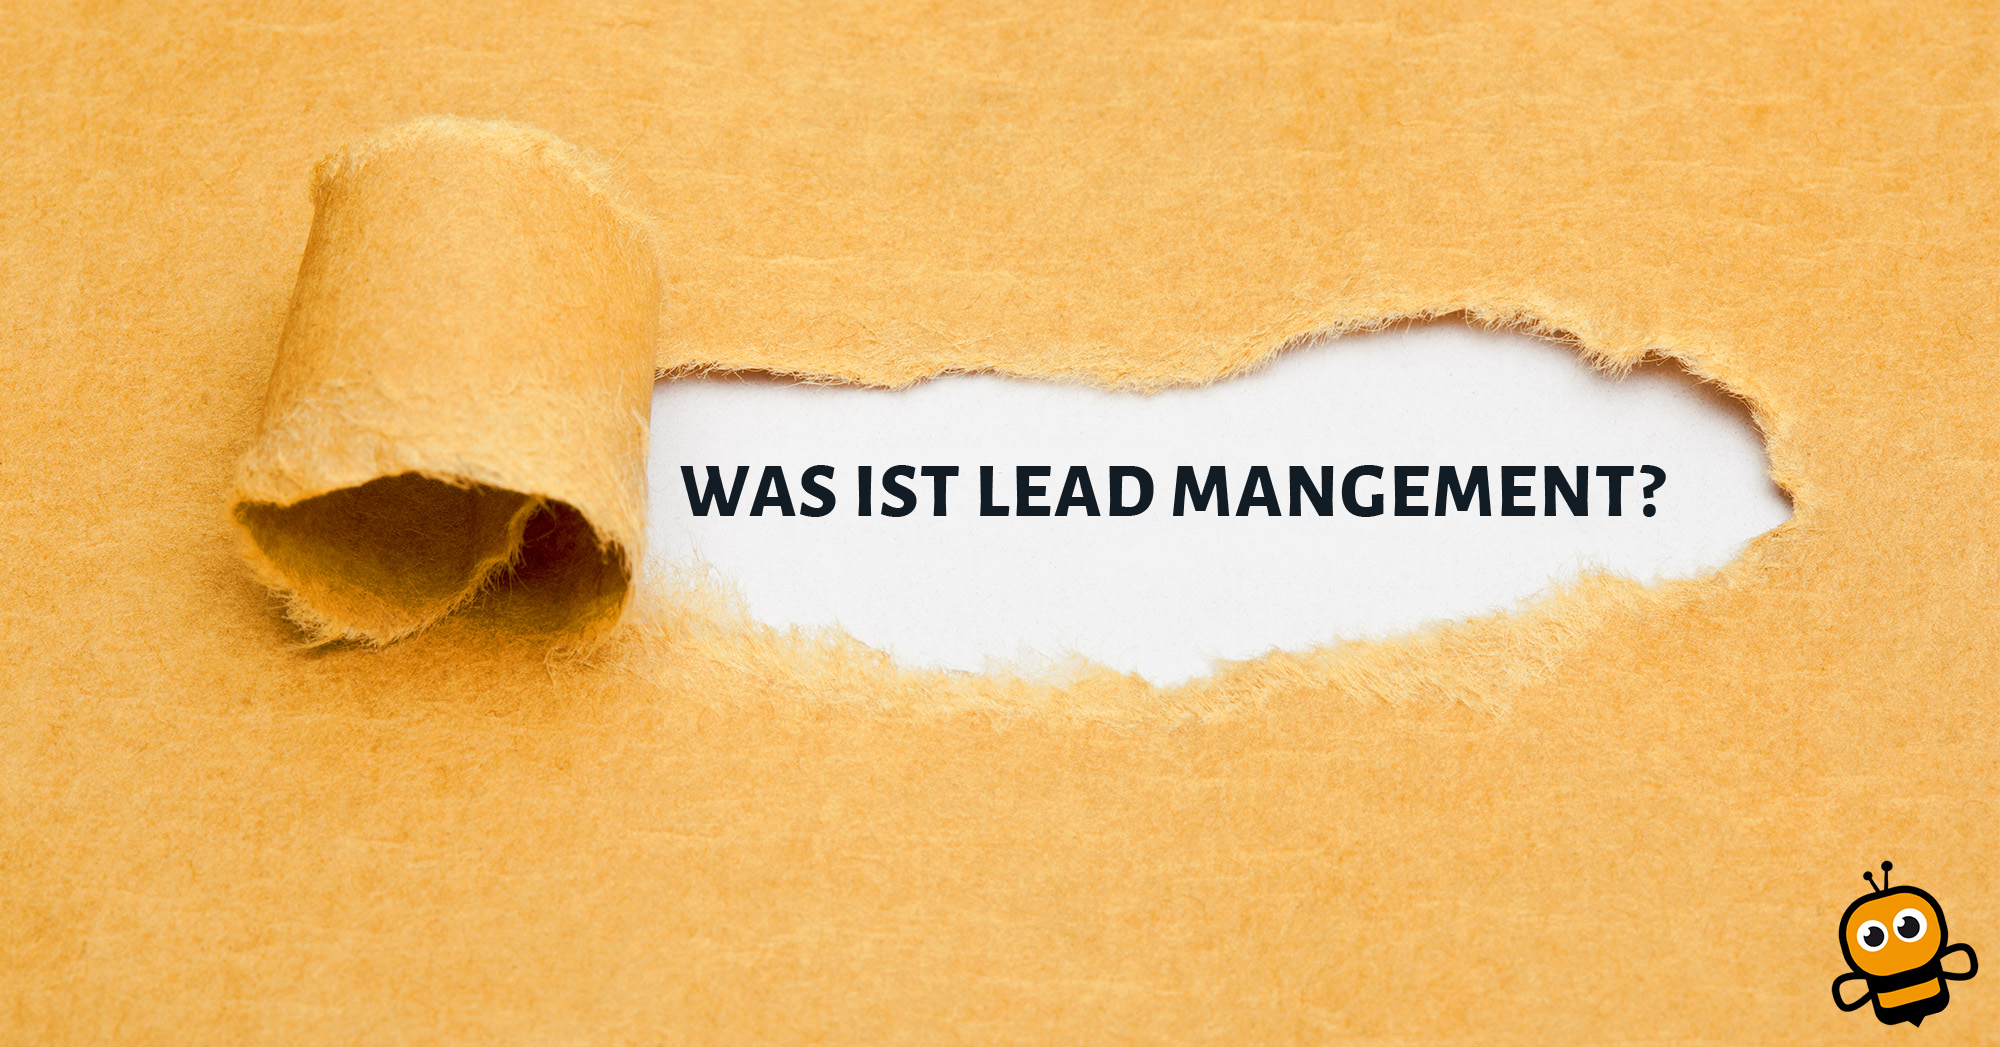 was ist leadmanagement